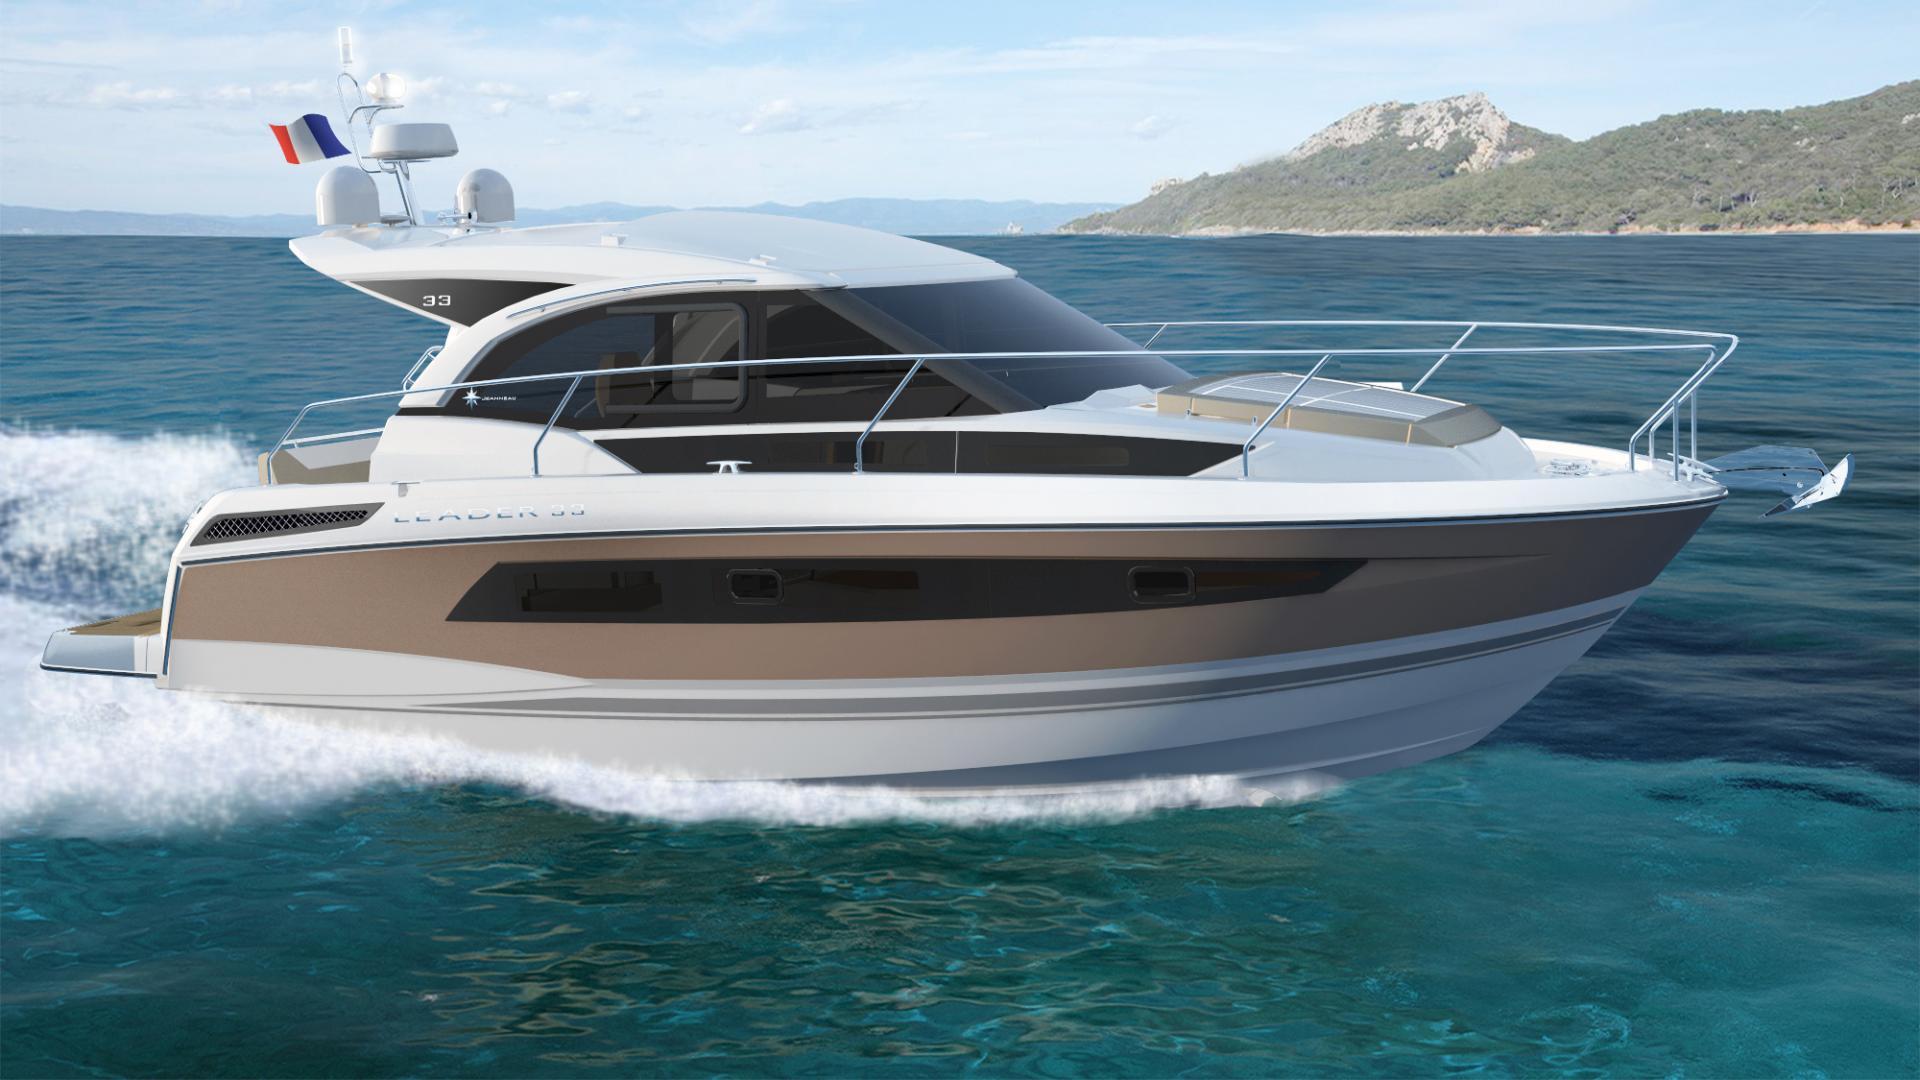 bateau Ocqueteau Leader 33